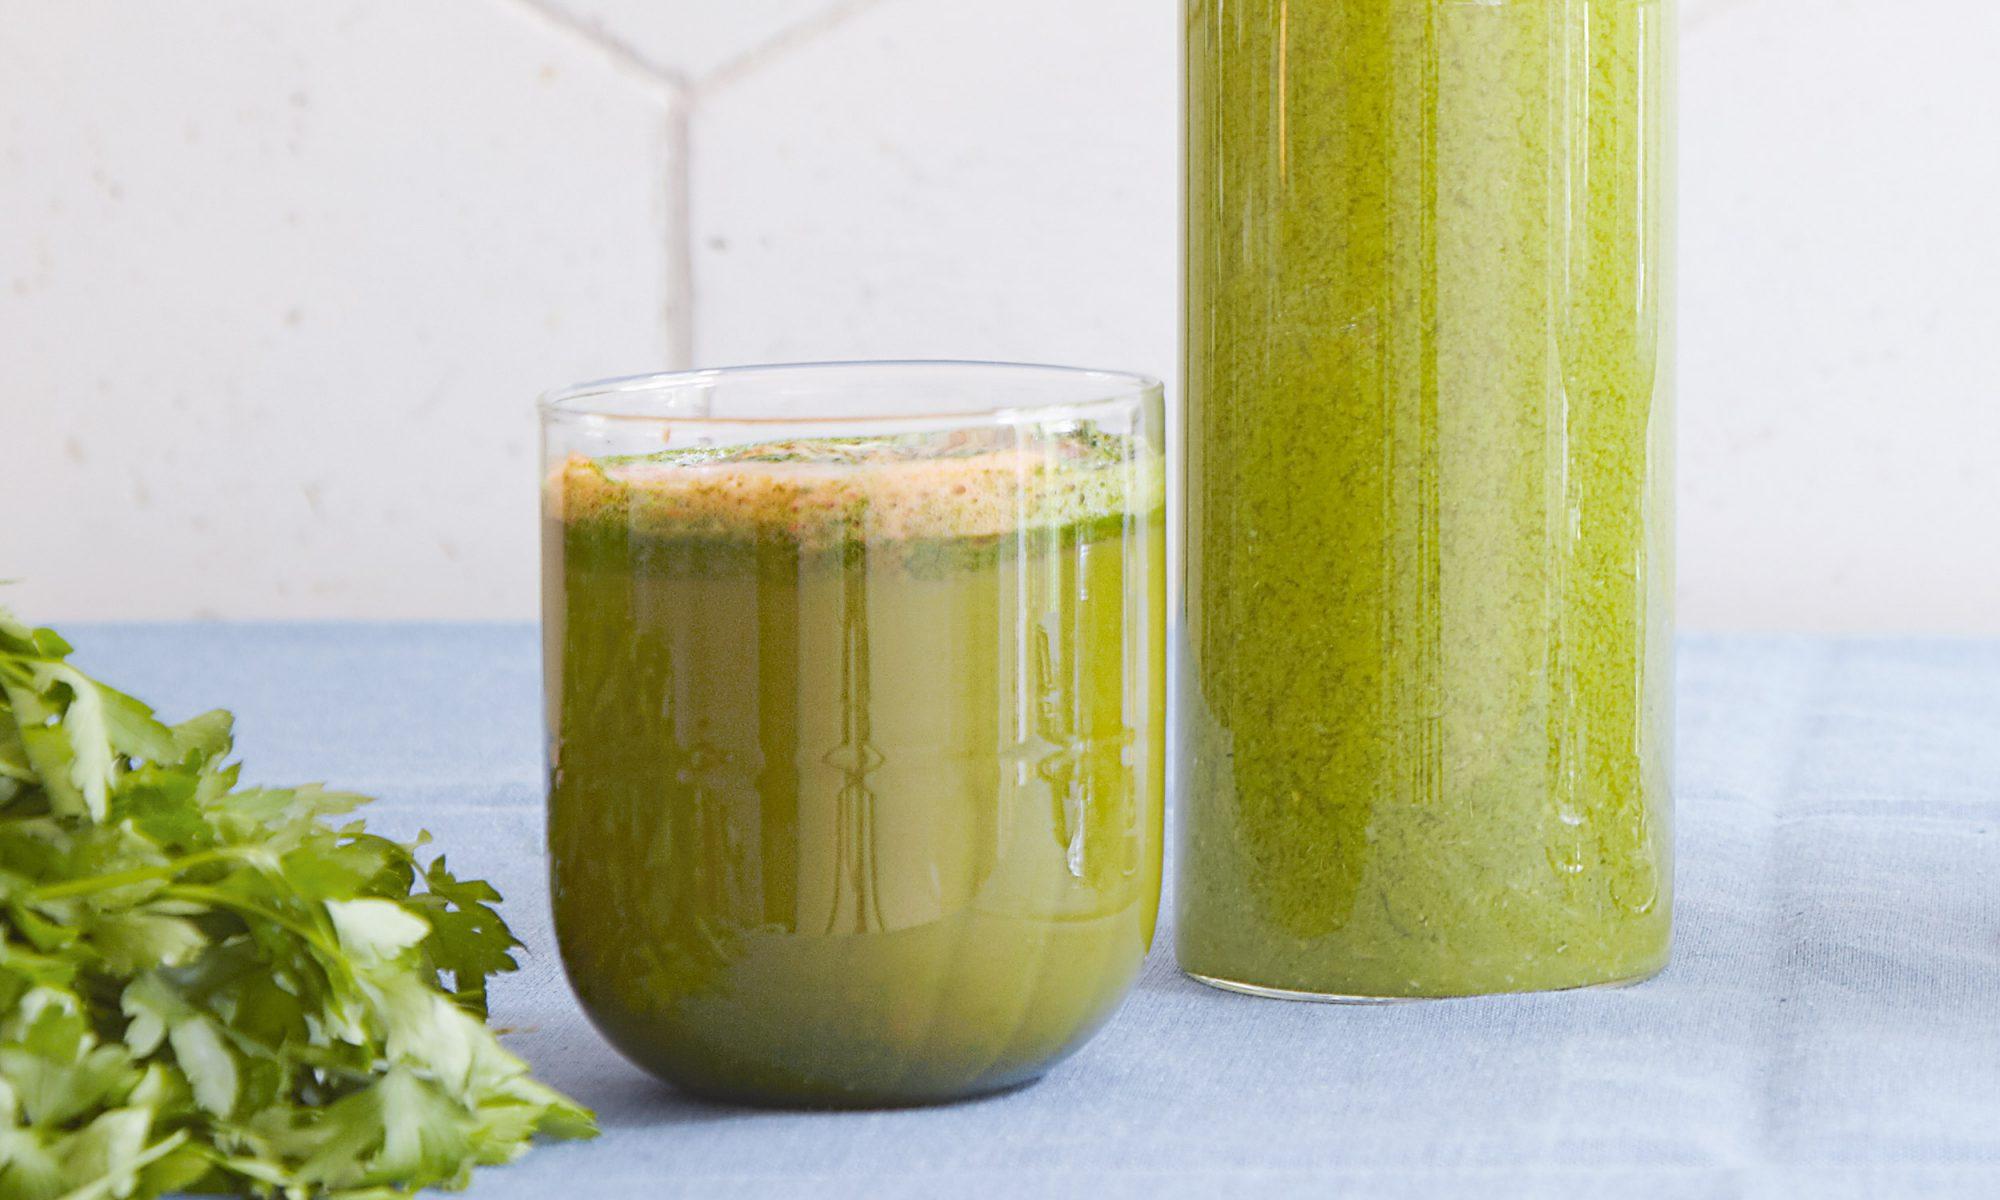 This Green Juice Has More Vitamin C Than Orange Juice